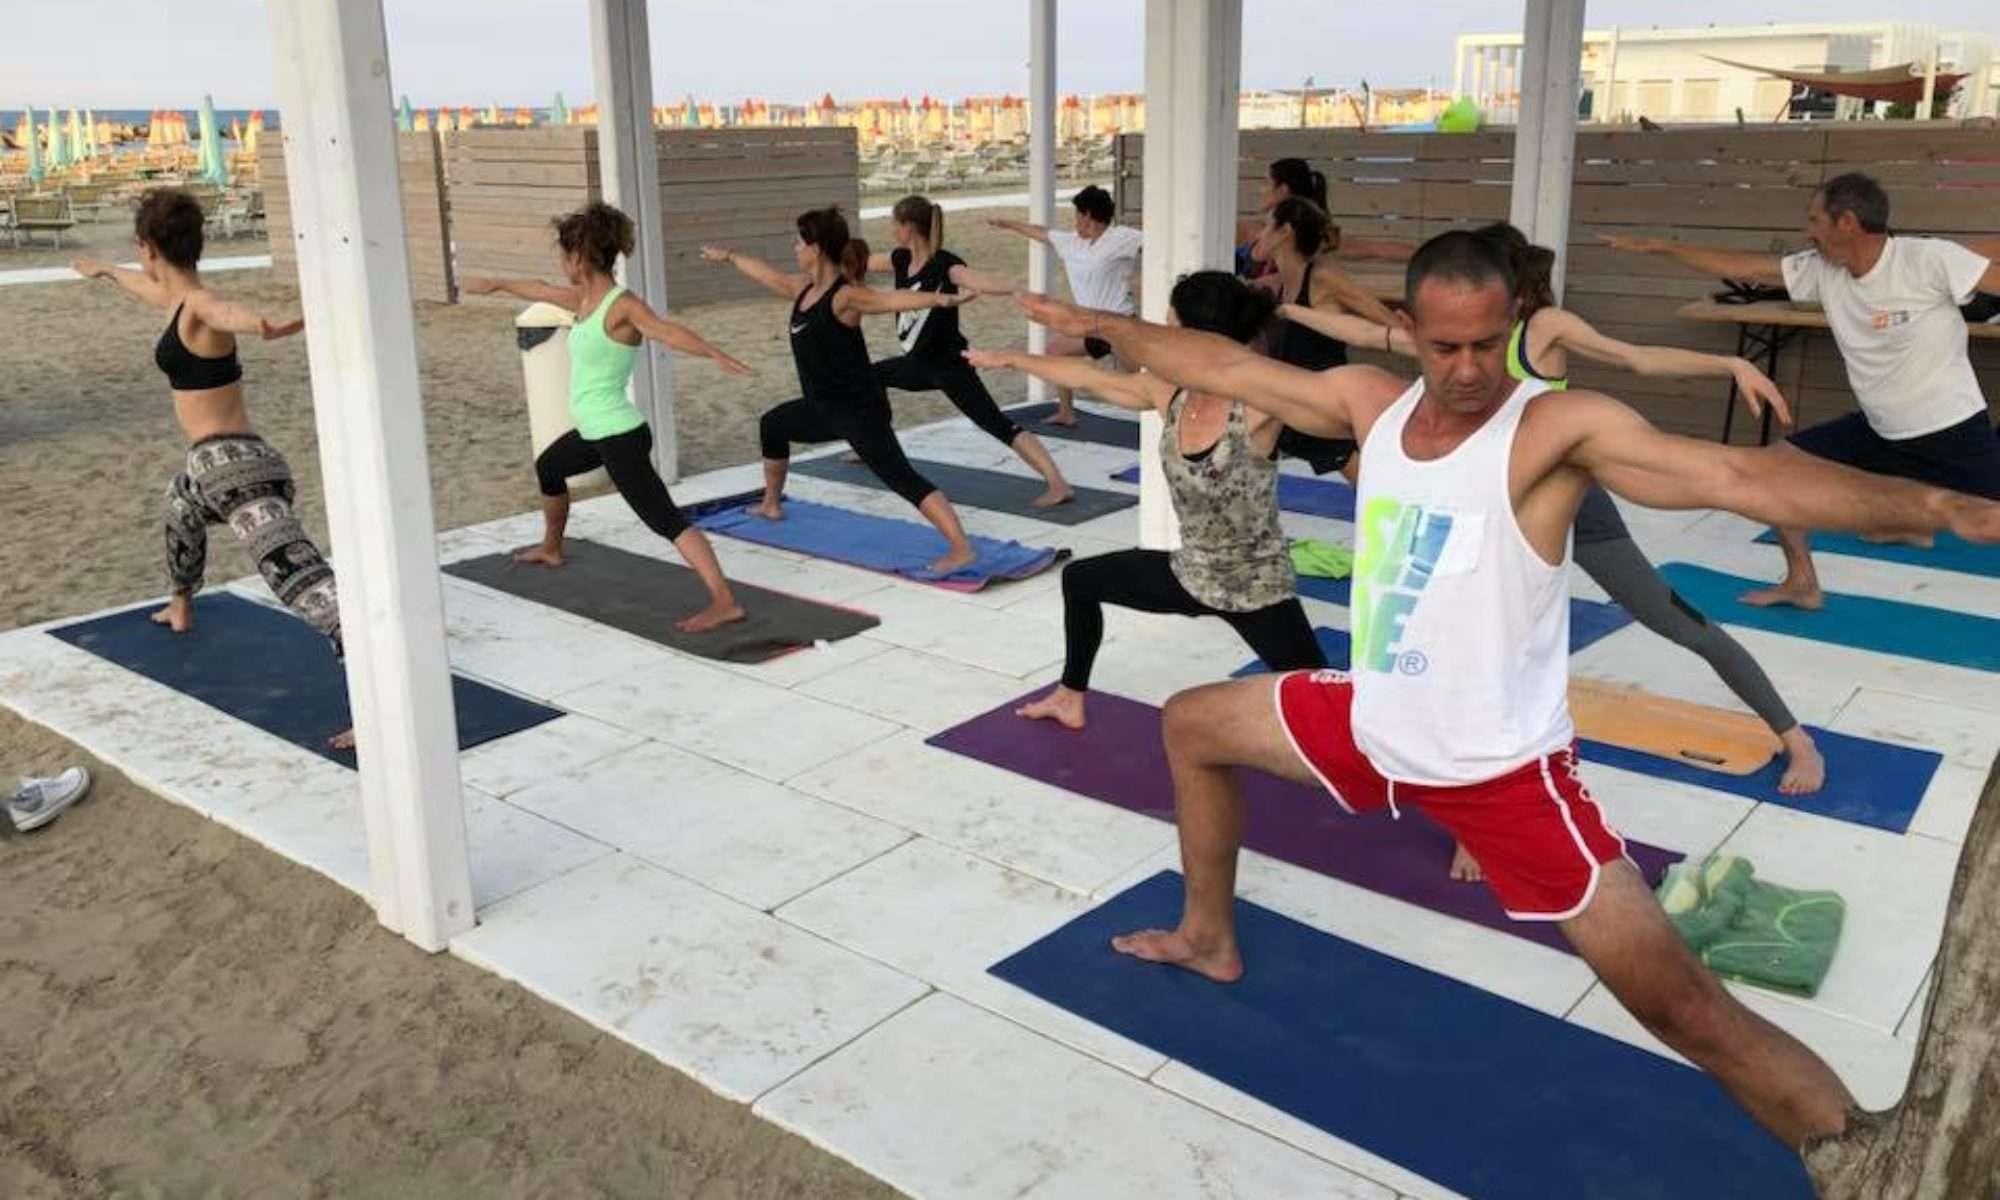 Yoga Rimini yoga, Ashtanga Yoga, Vinyasa Flow-Power Yoga rimini -riccione,San Giovanni in Persiceto, Ravenna,san marino, Rovigo, Bologna